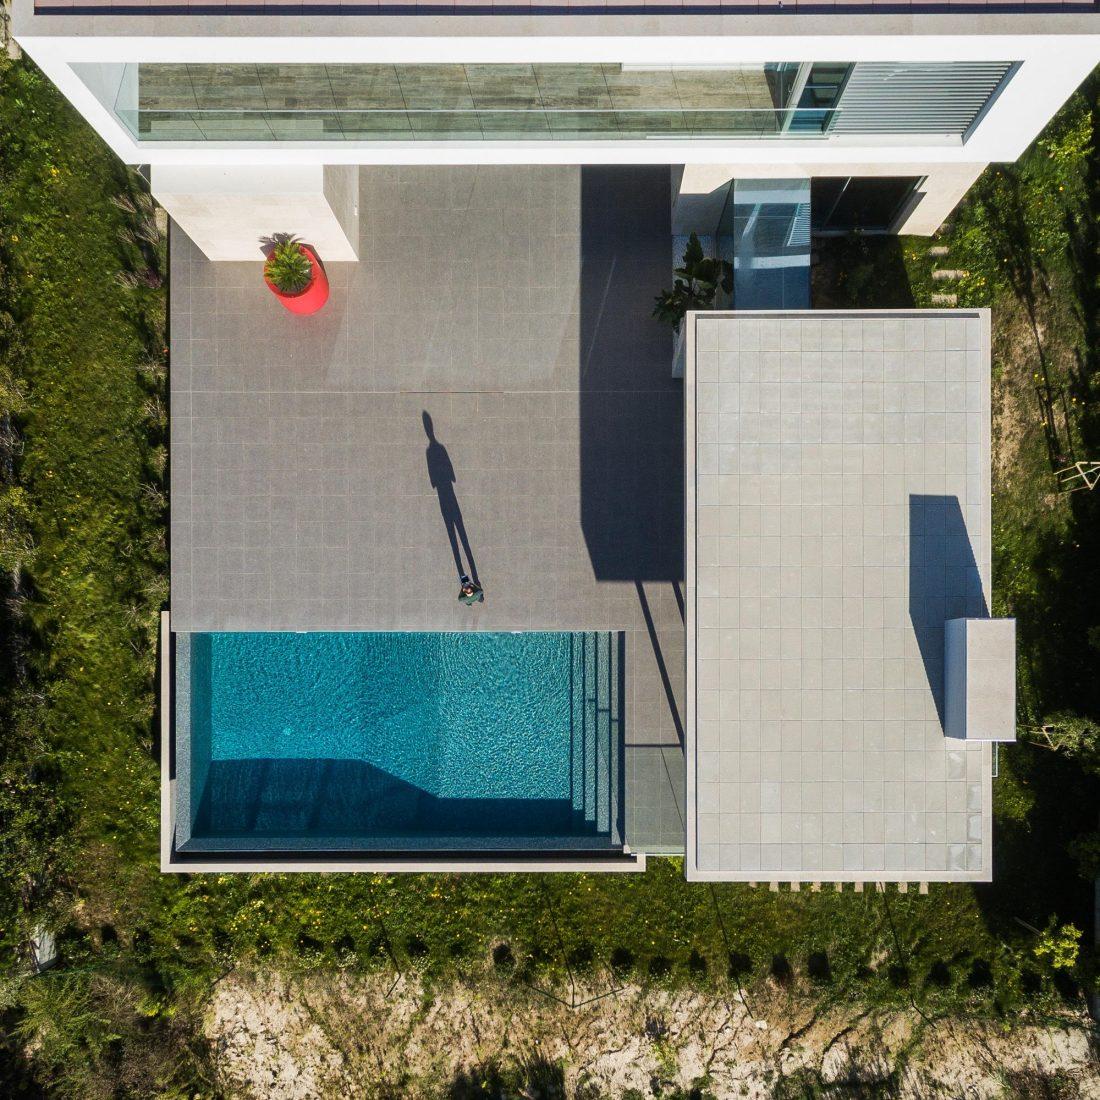 Дом в Обидуше, Португалия, от студии RSM arquitecto и Russell Jones Architects 8